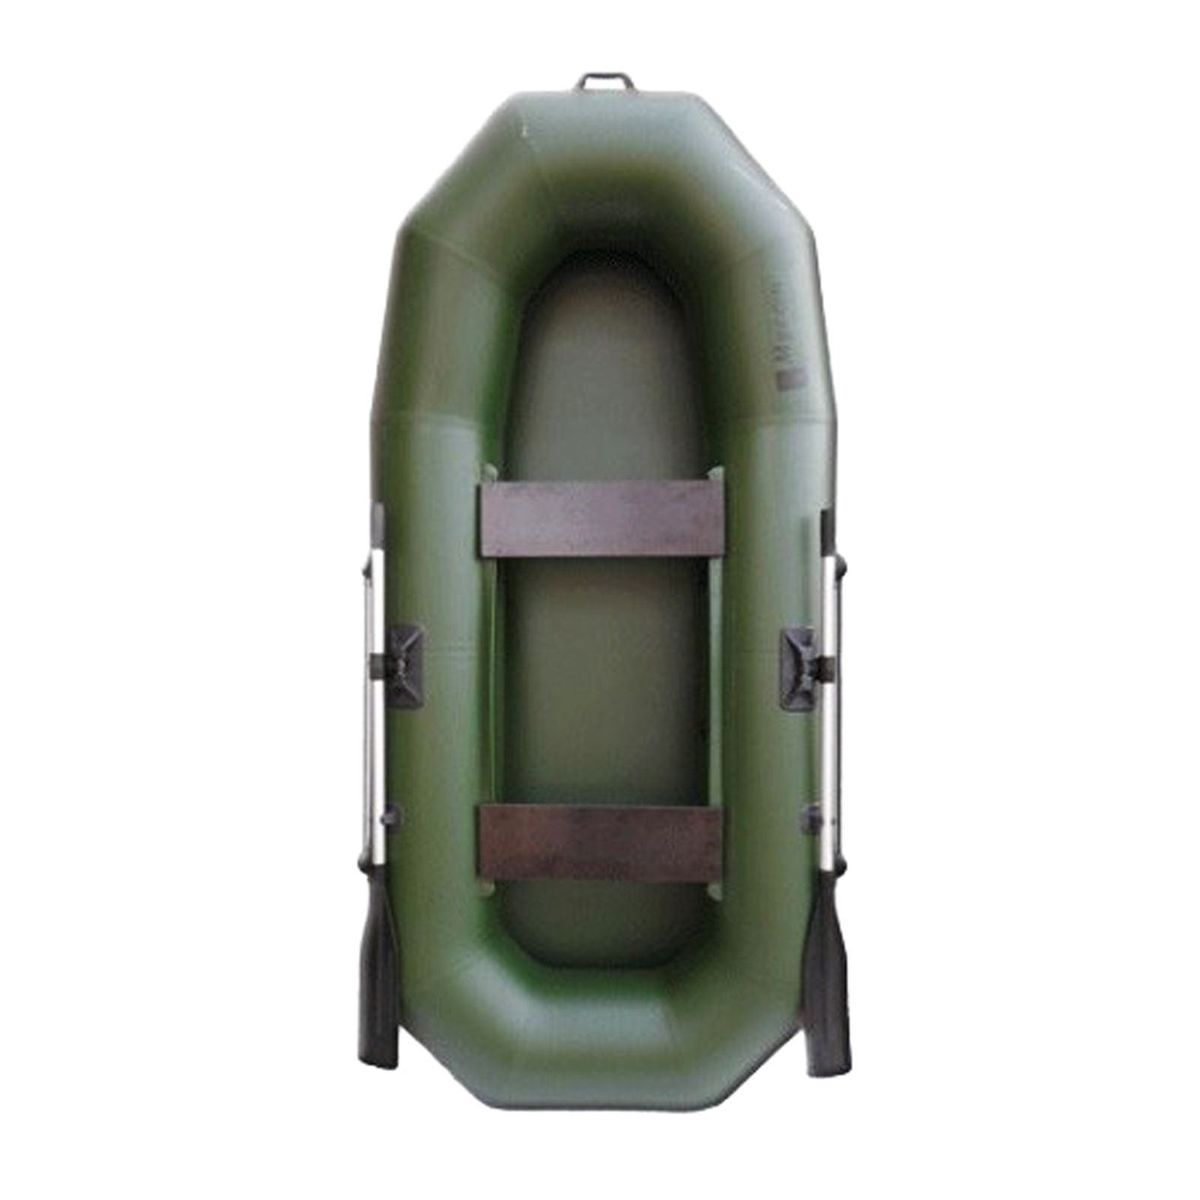 Лодка надувная Муссон Н 270, цвет: зеленый